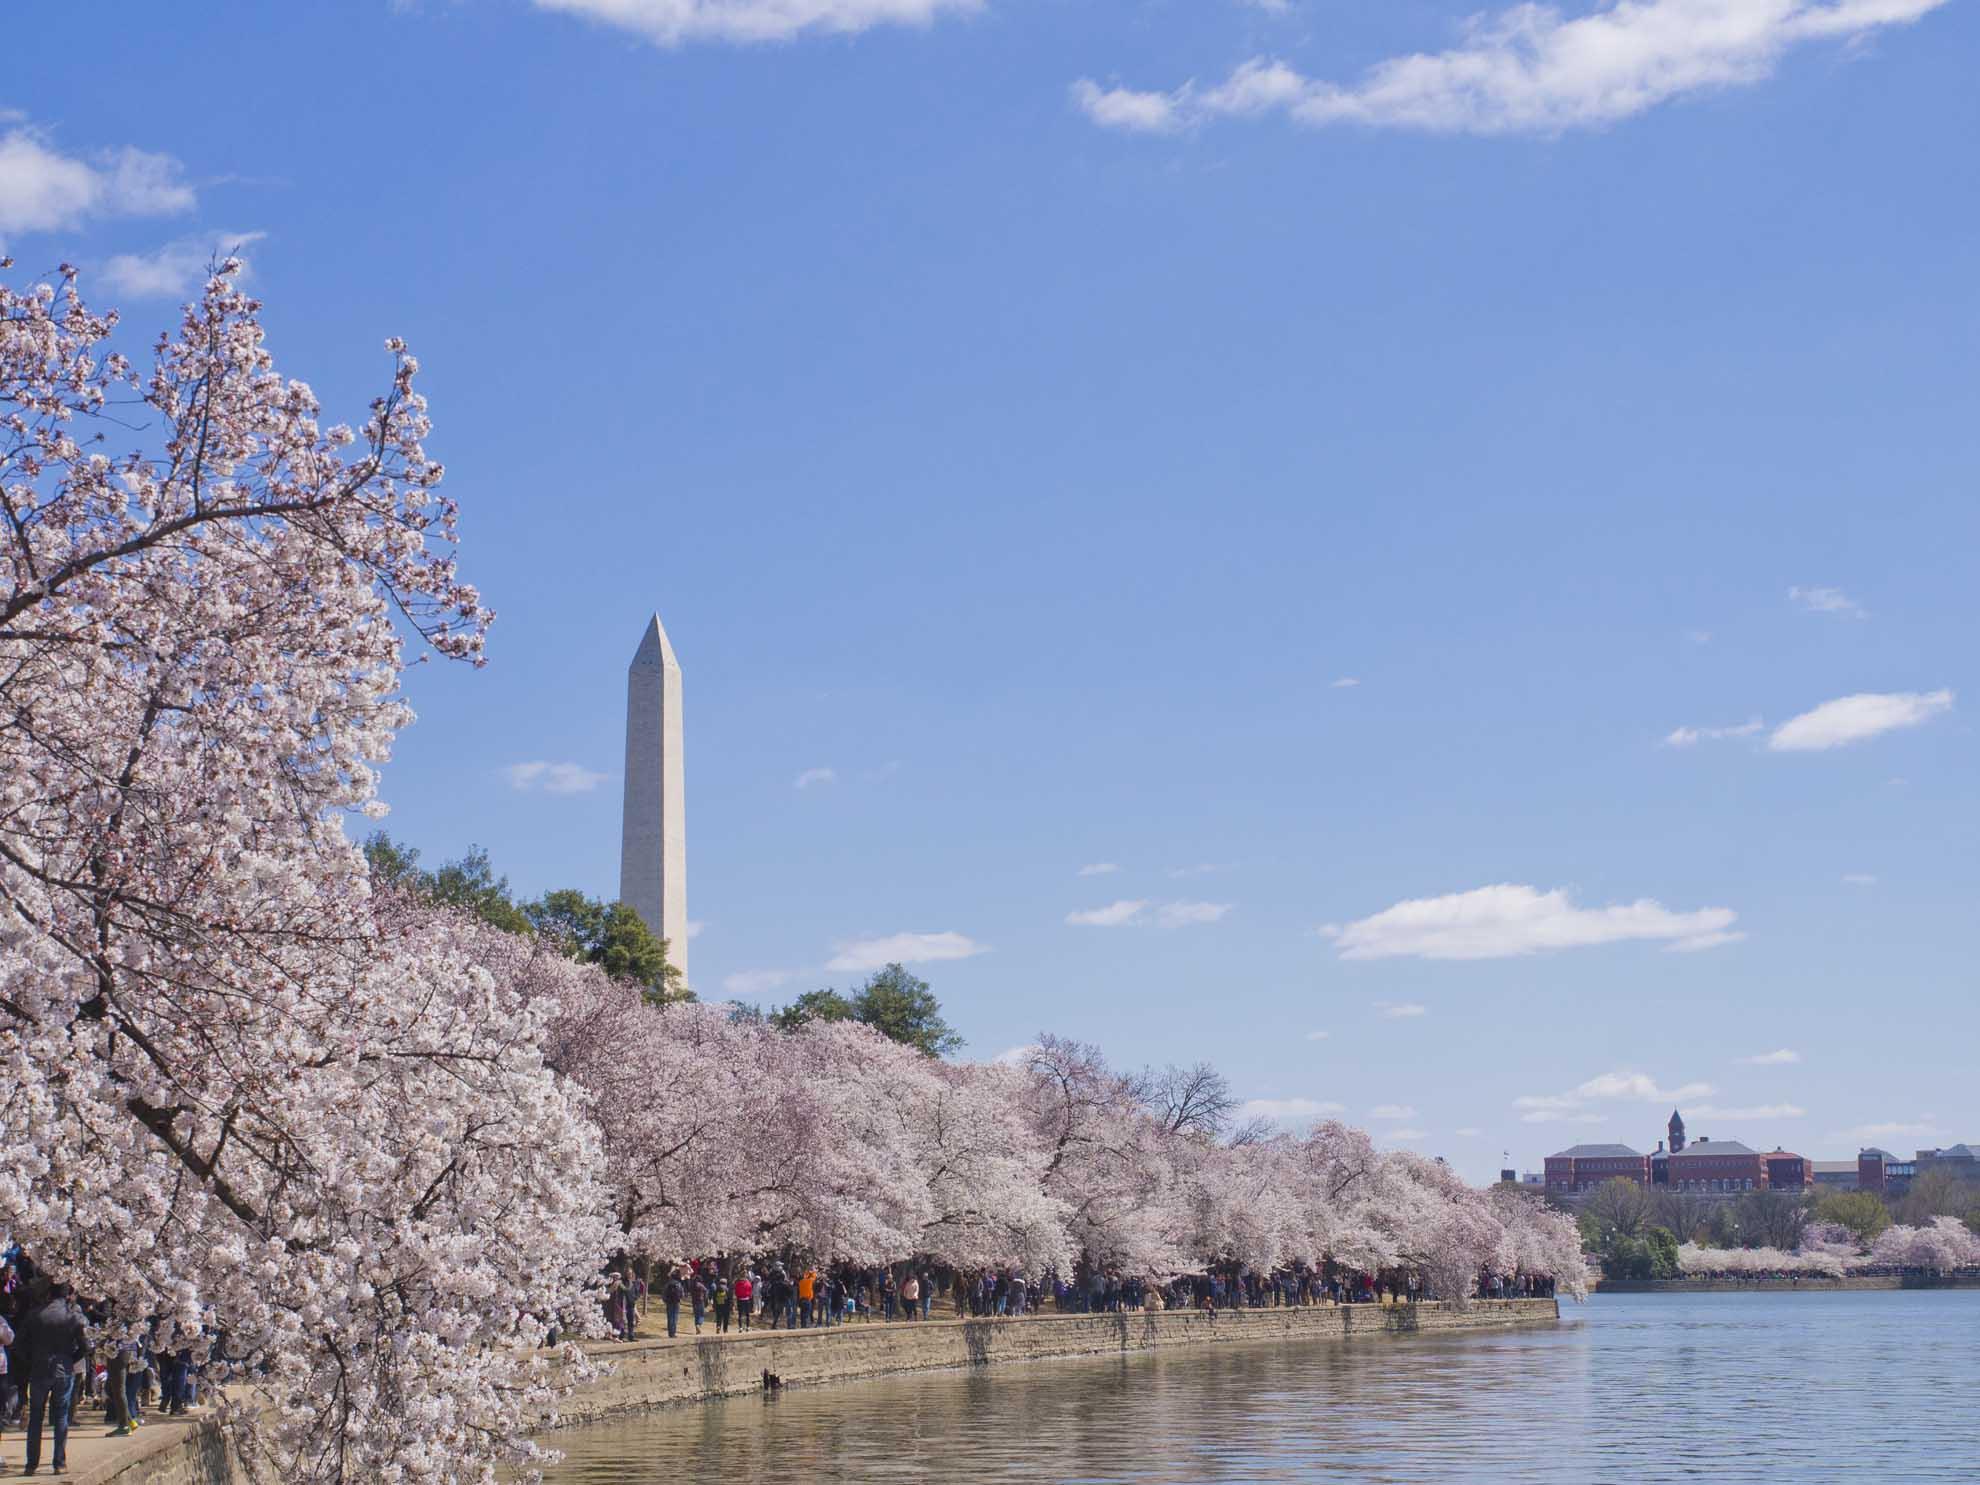 Washington Monument from the Tidal Basin